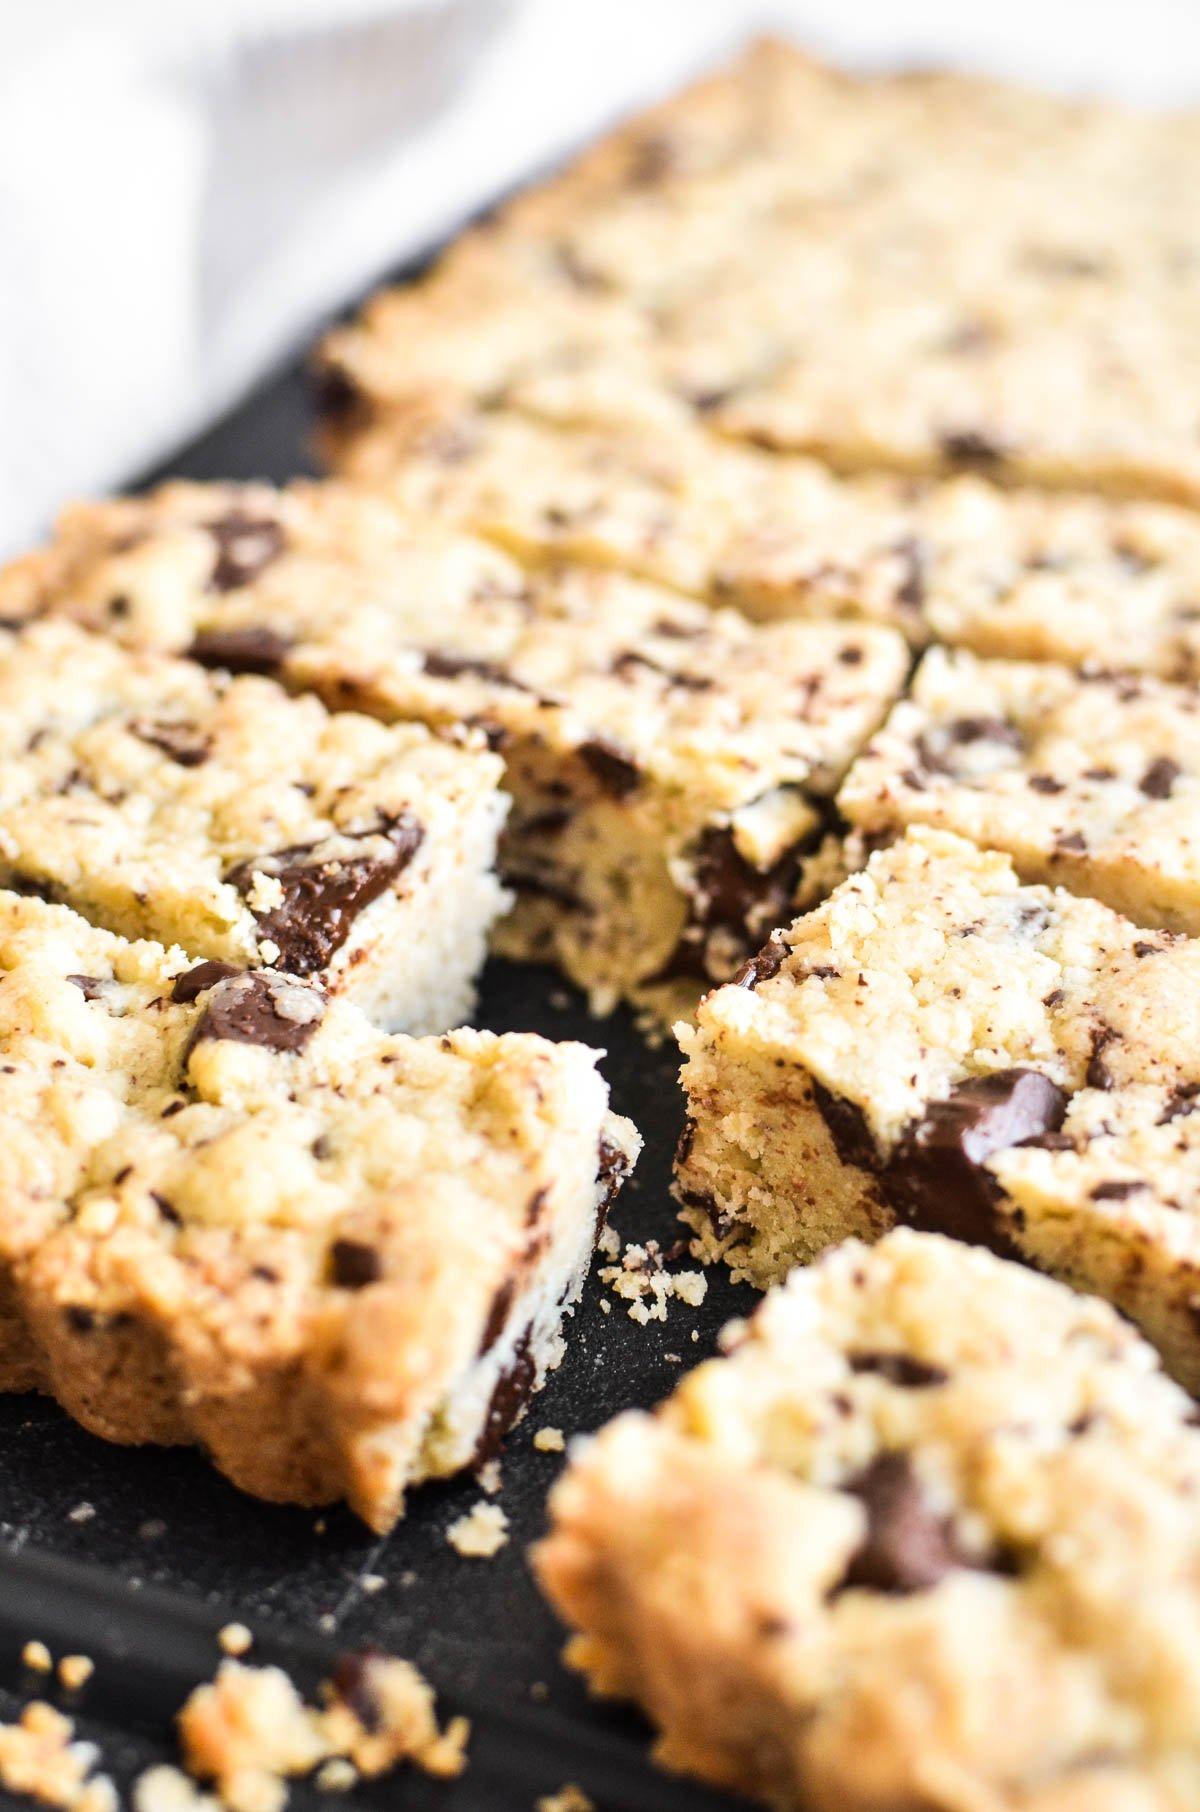 Chocolate chunk shortbread cookies on a black cutting board.